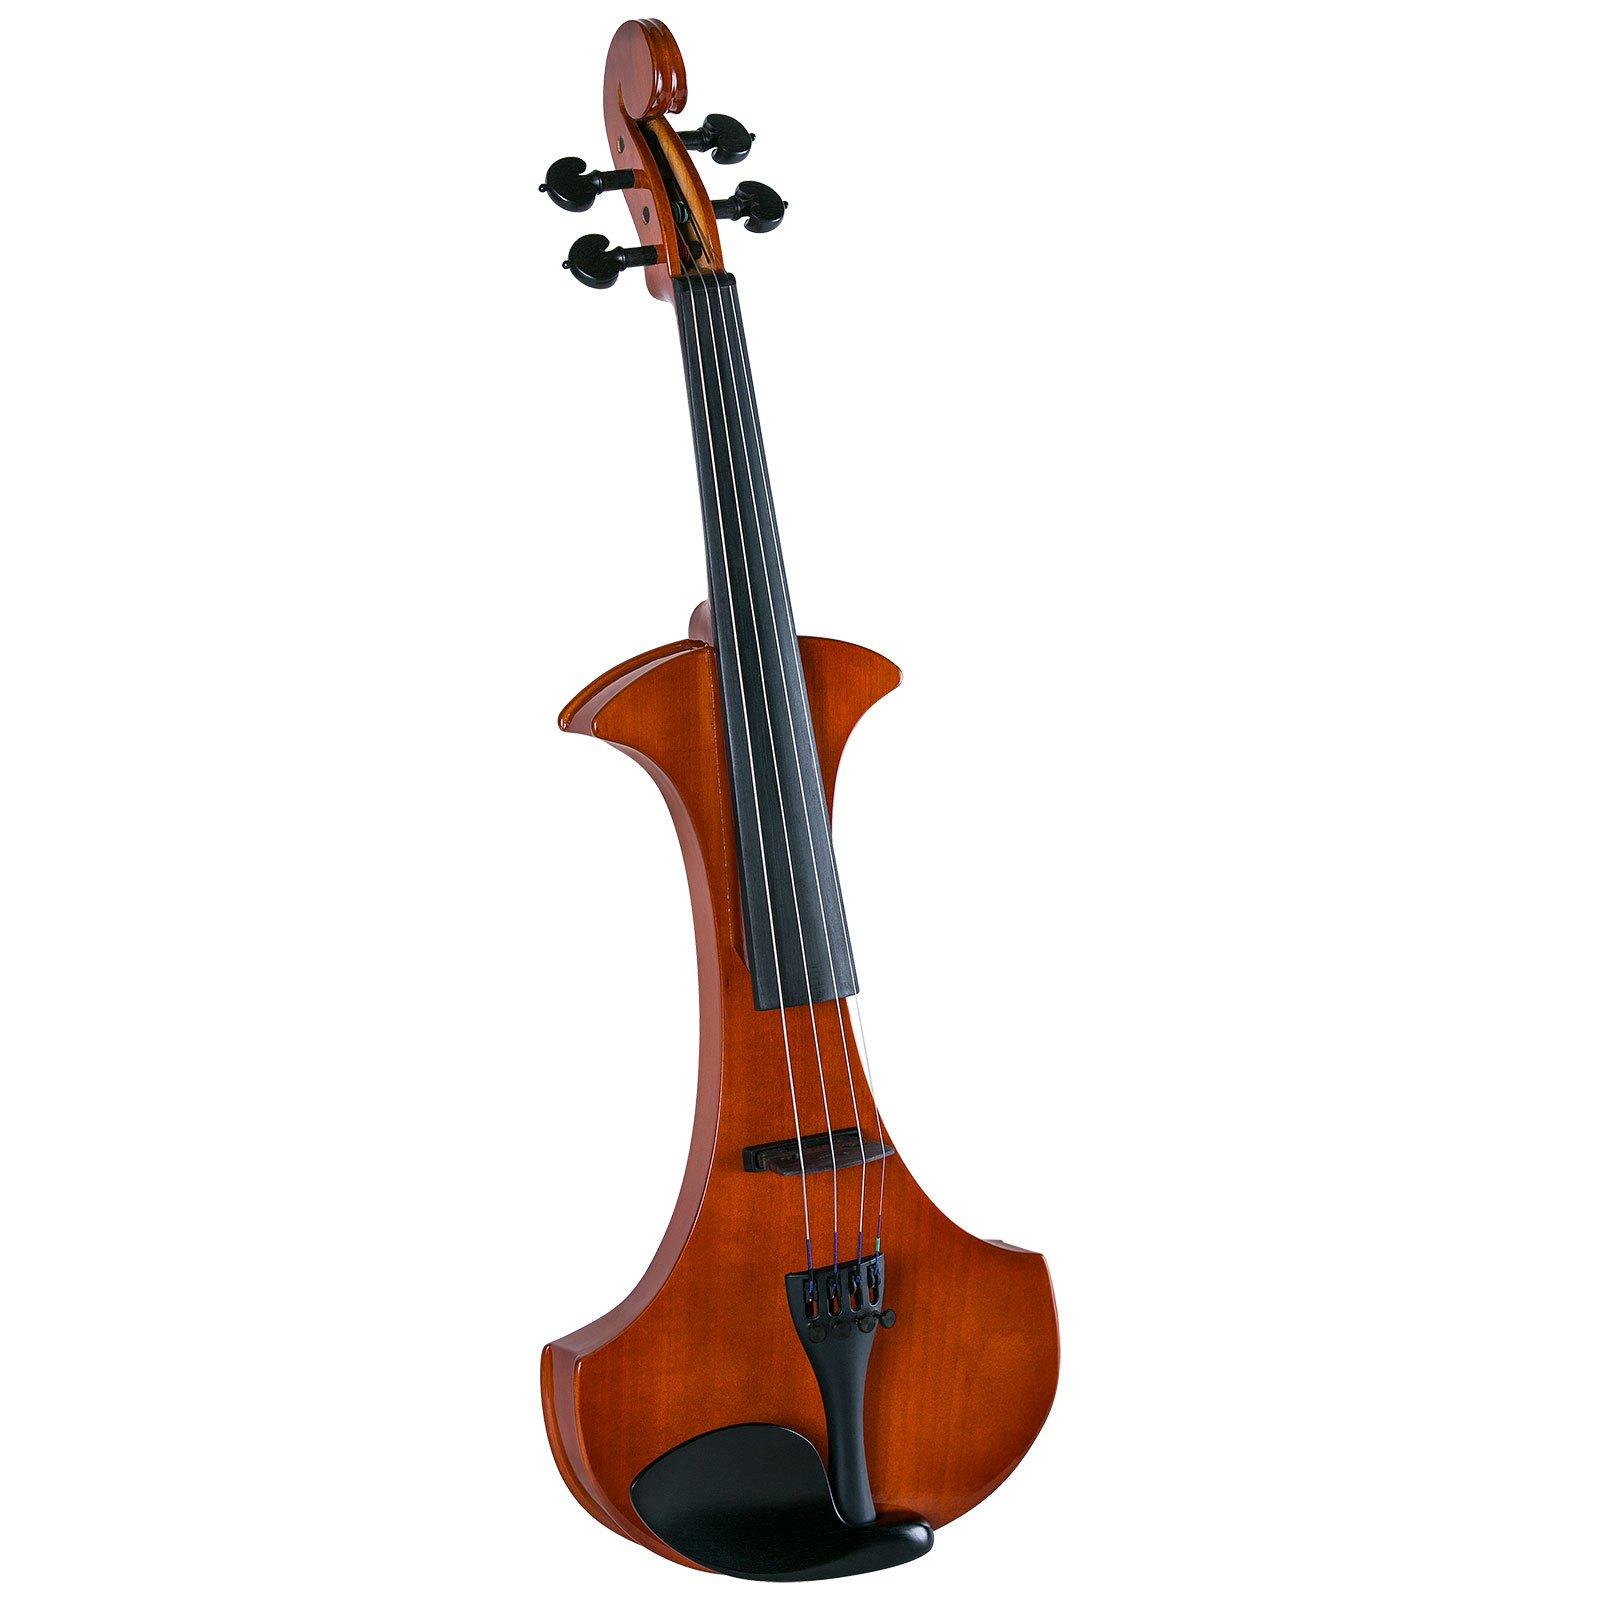 Cremona SV-180E Premier Student Electric Violin Outfit - 4/4 Size